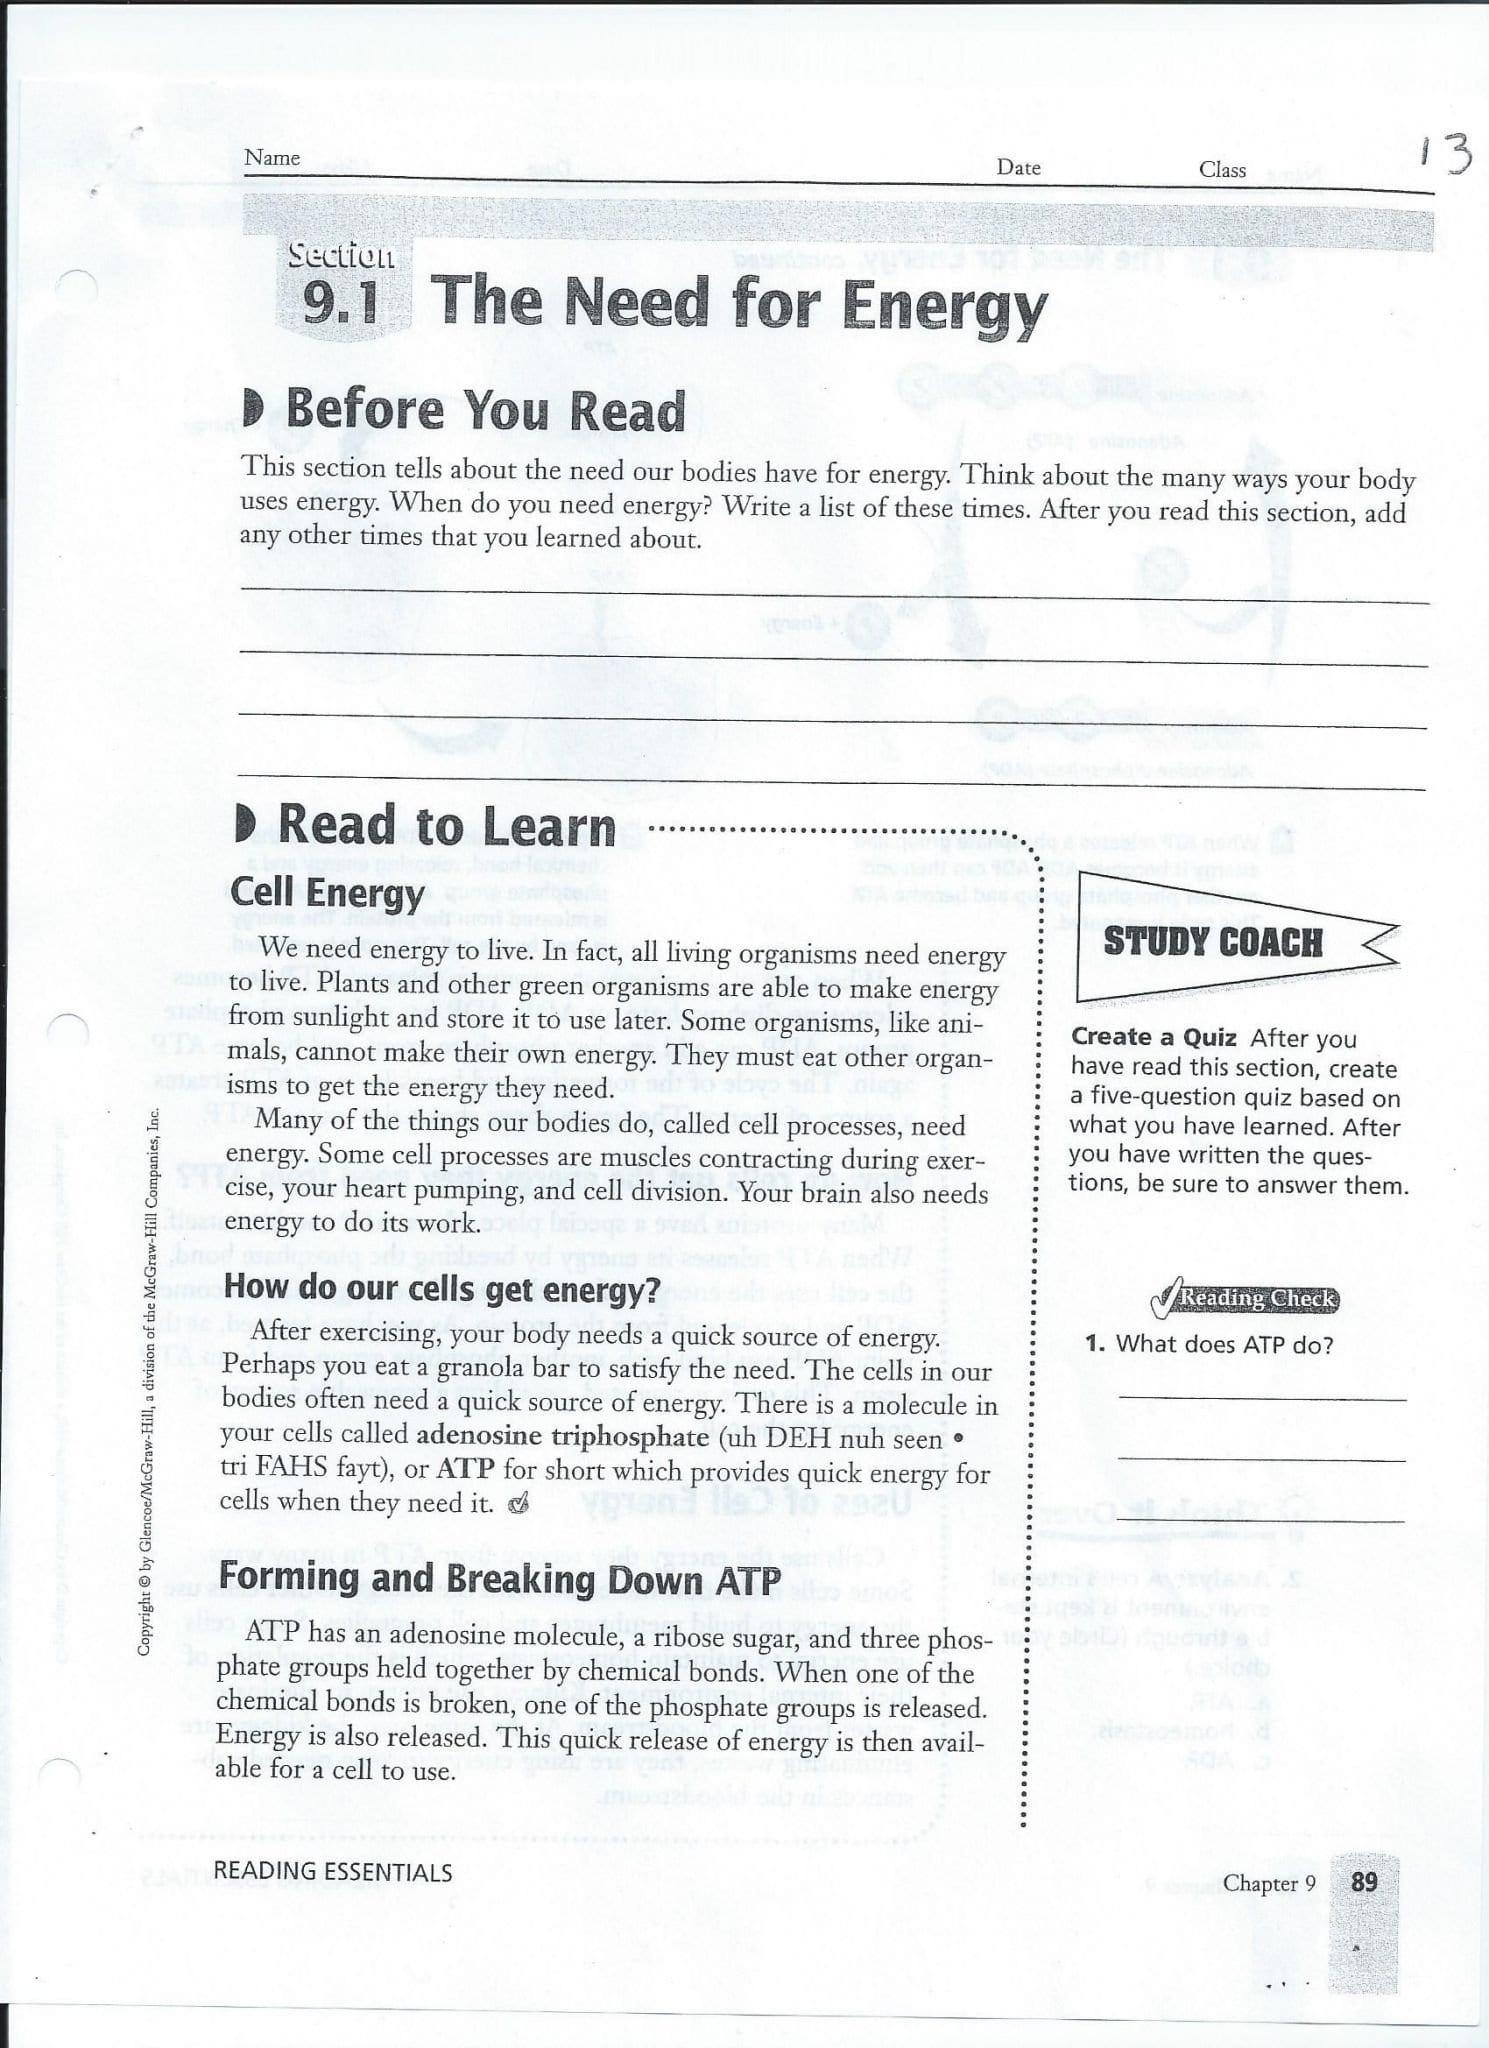 Chapter 7 Active Reading Worksheets Cellular Respiration